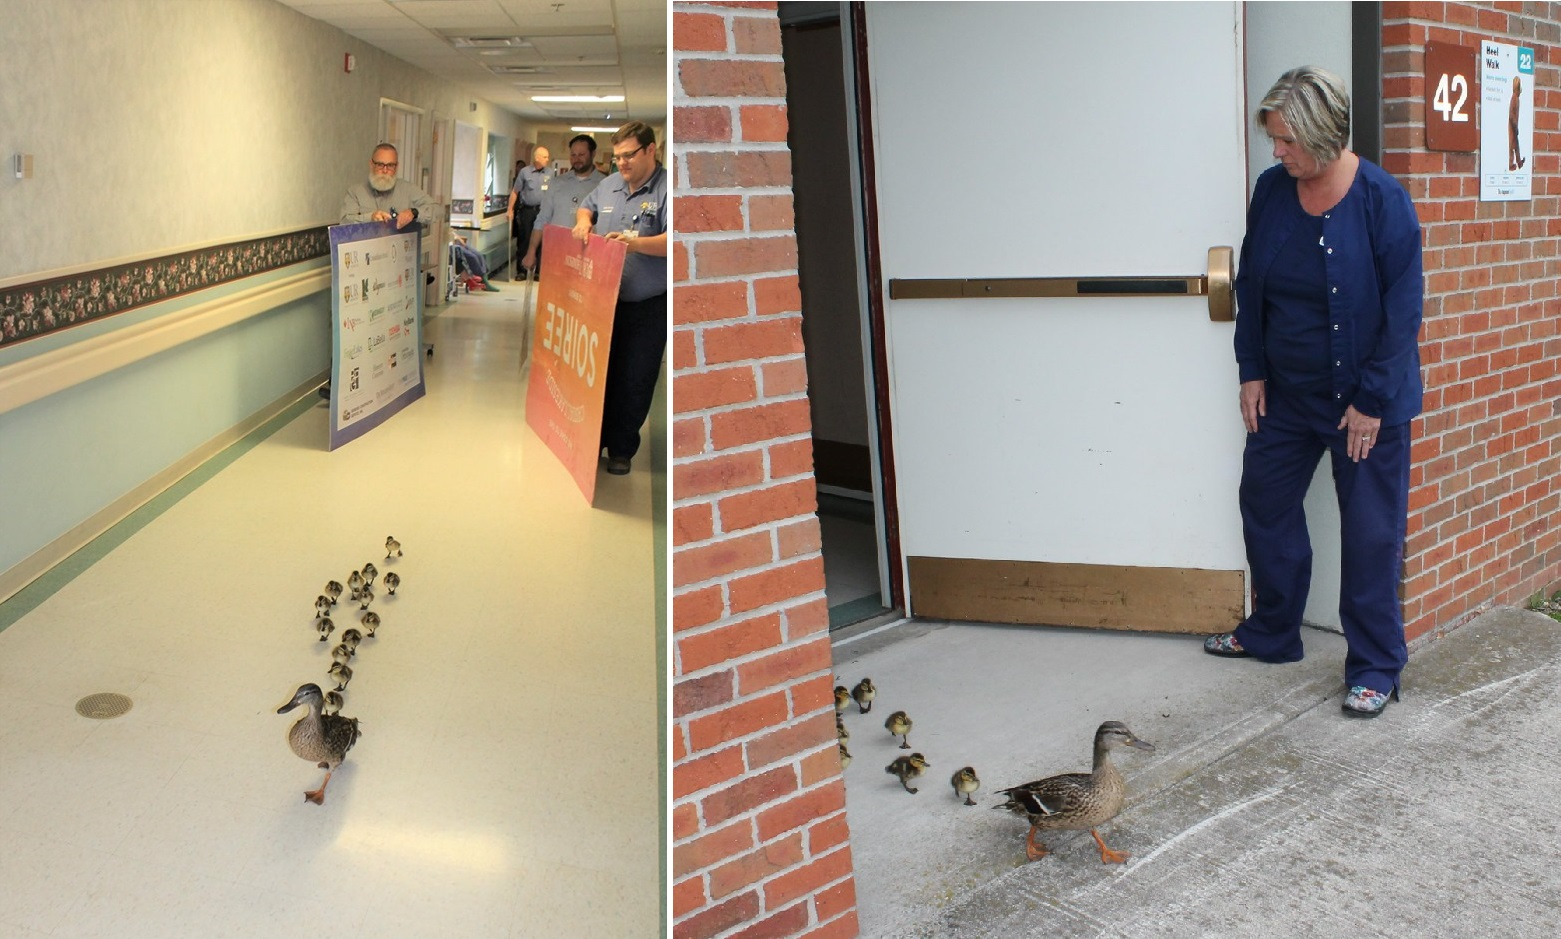 canandaigua ducks_1558454569450.jpg-118809282.jpg